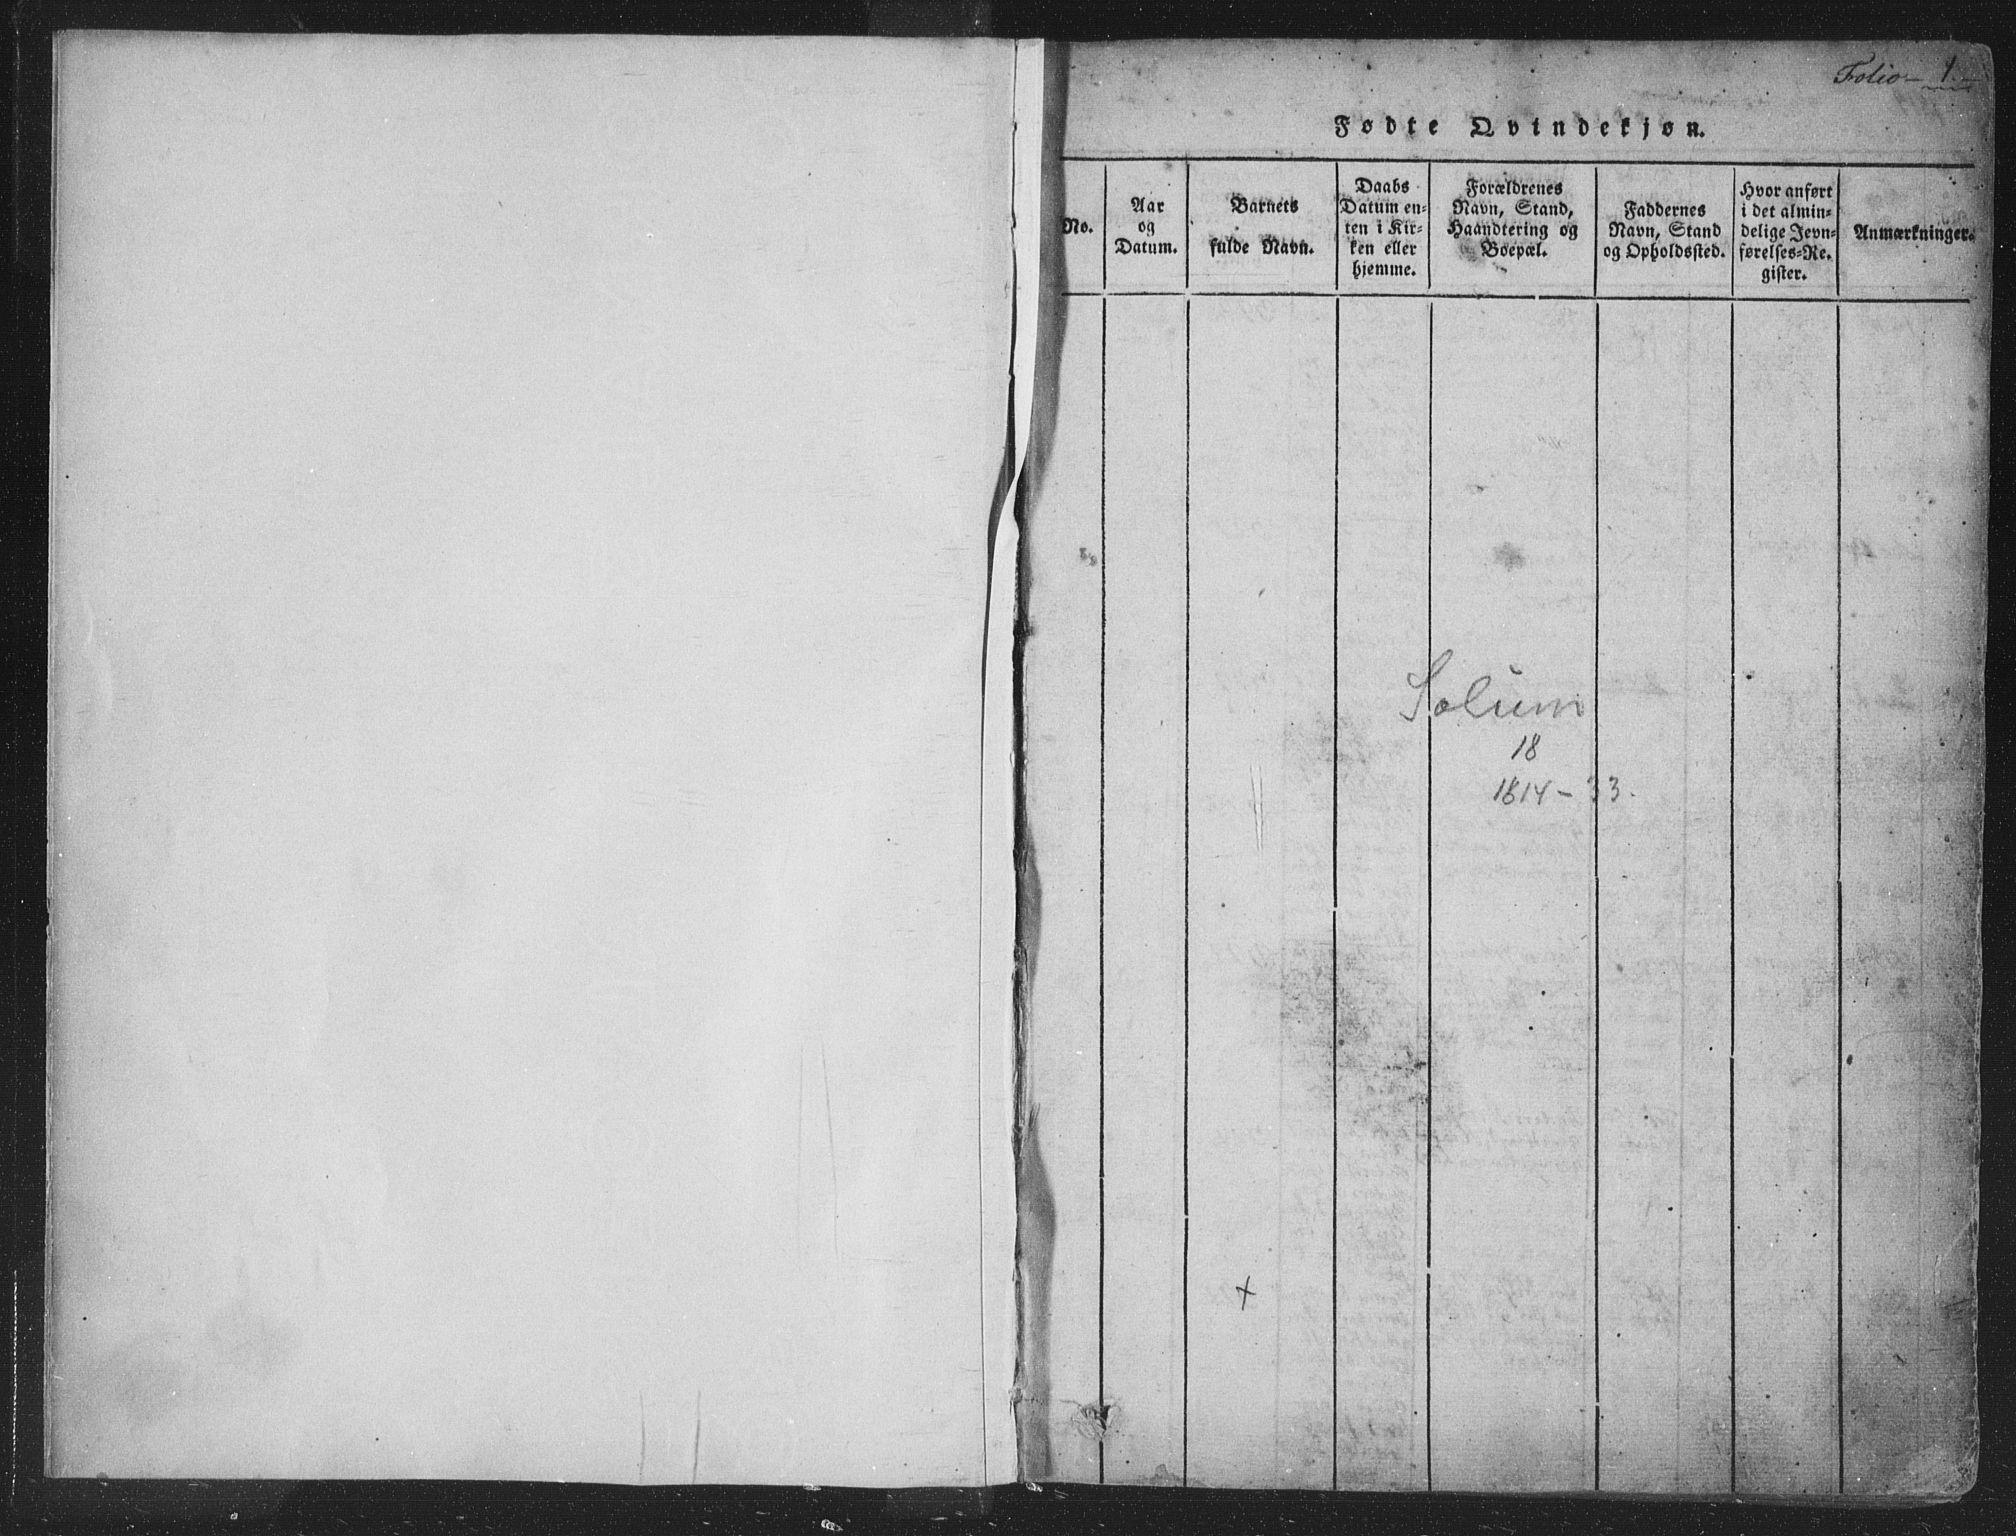 SAKO, Solum kirkebøker, F/Fa/L0004: Ministerialbok nr. I 4, 1814-1833, s. 1